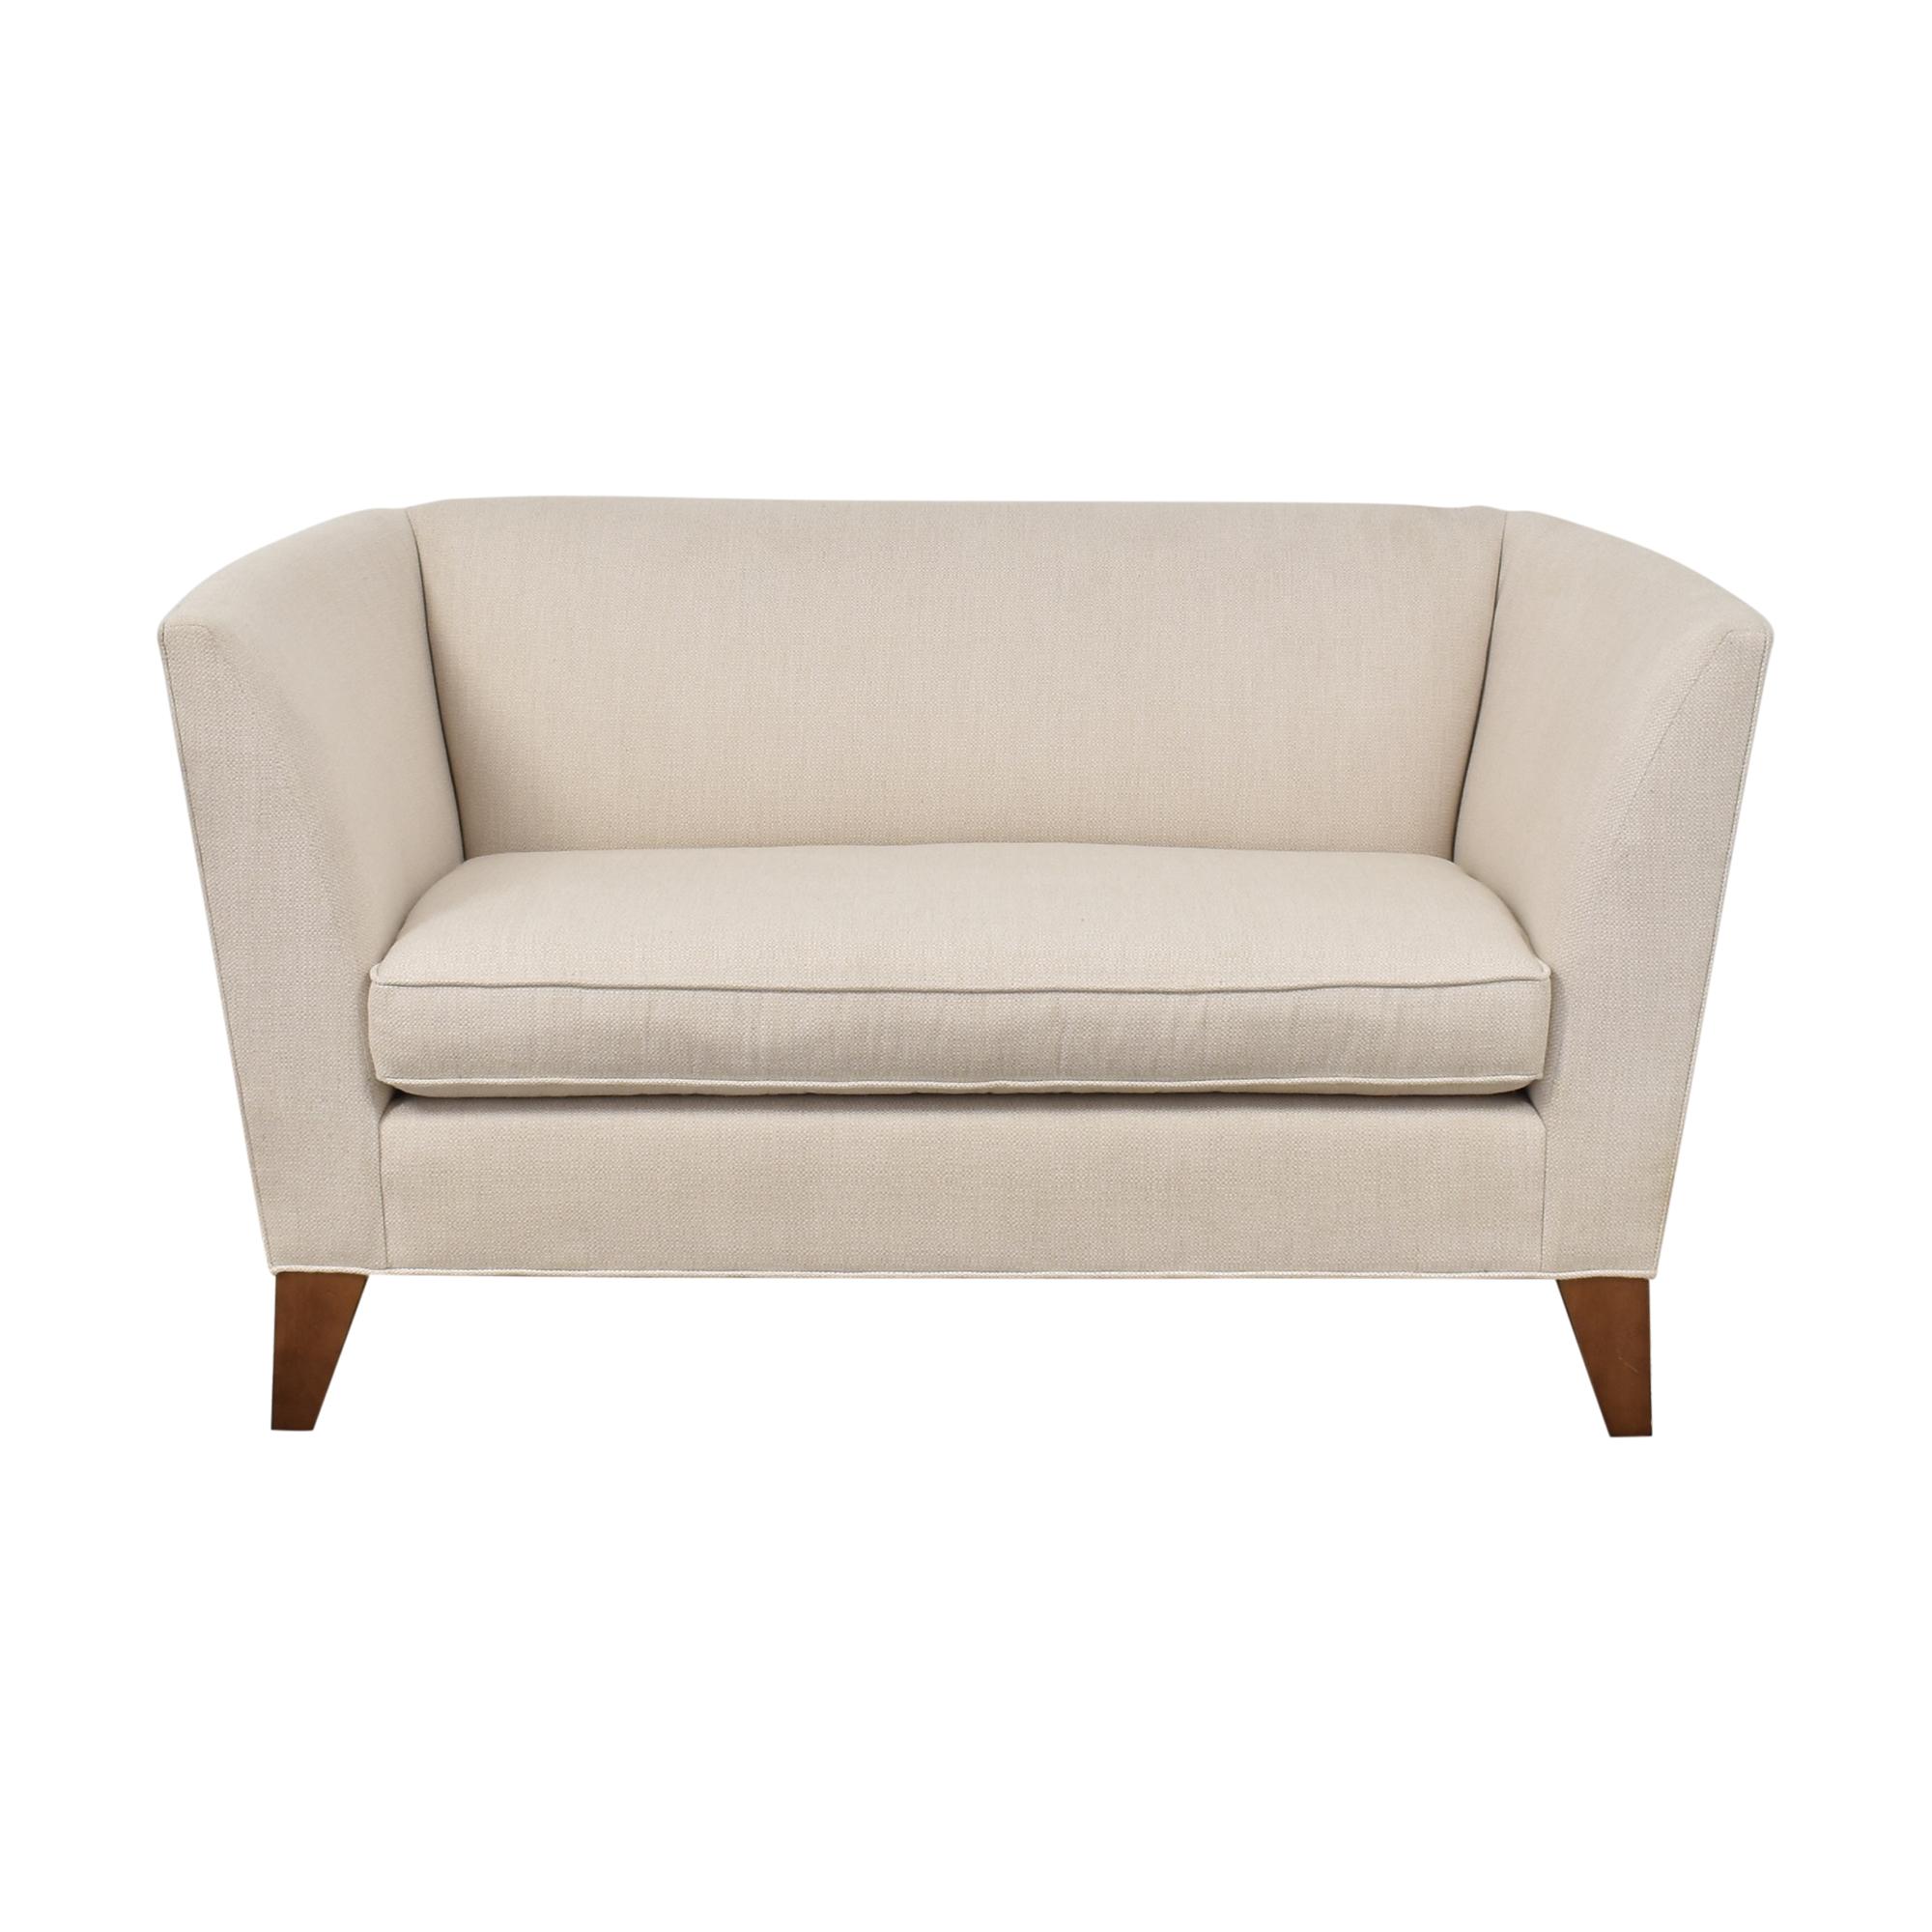 Mitchell Gold + Bob Williams Mona Sofette / Chairs